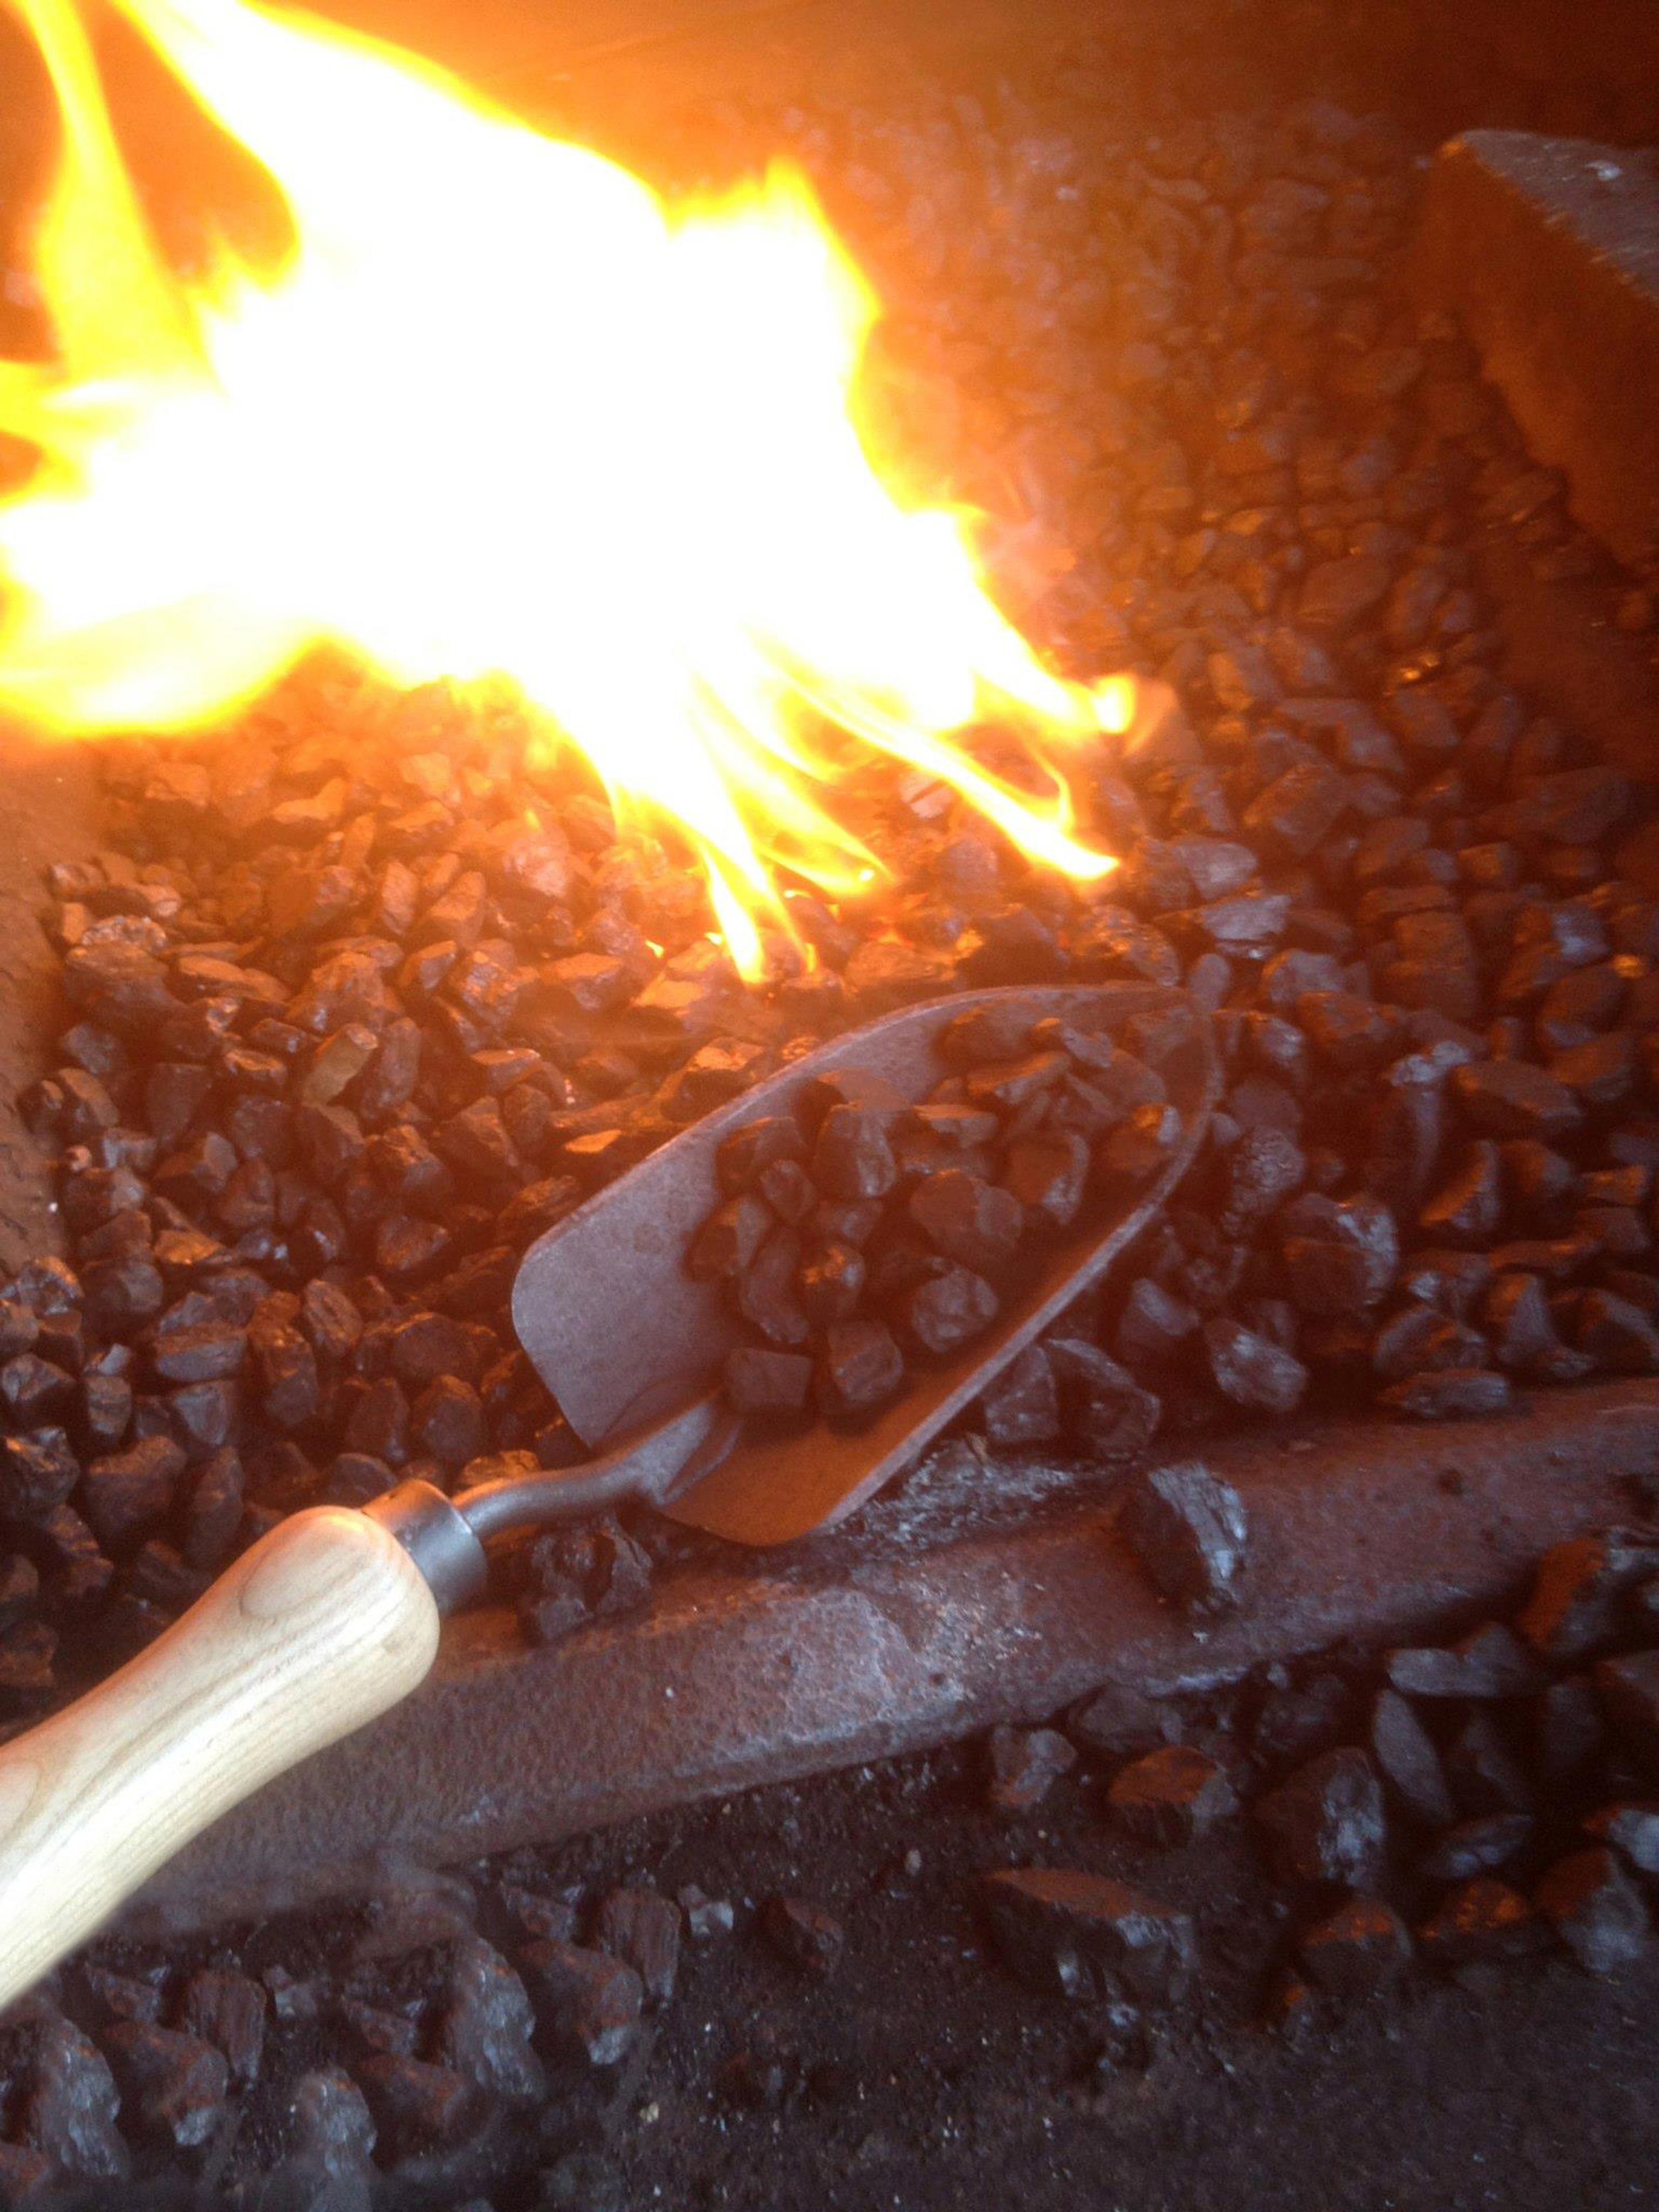 31-3000 DeWit Trowel Forging.jpg